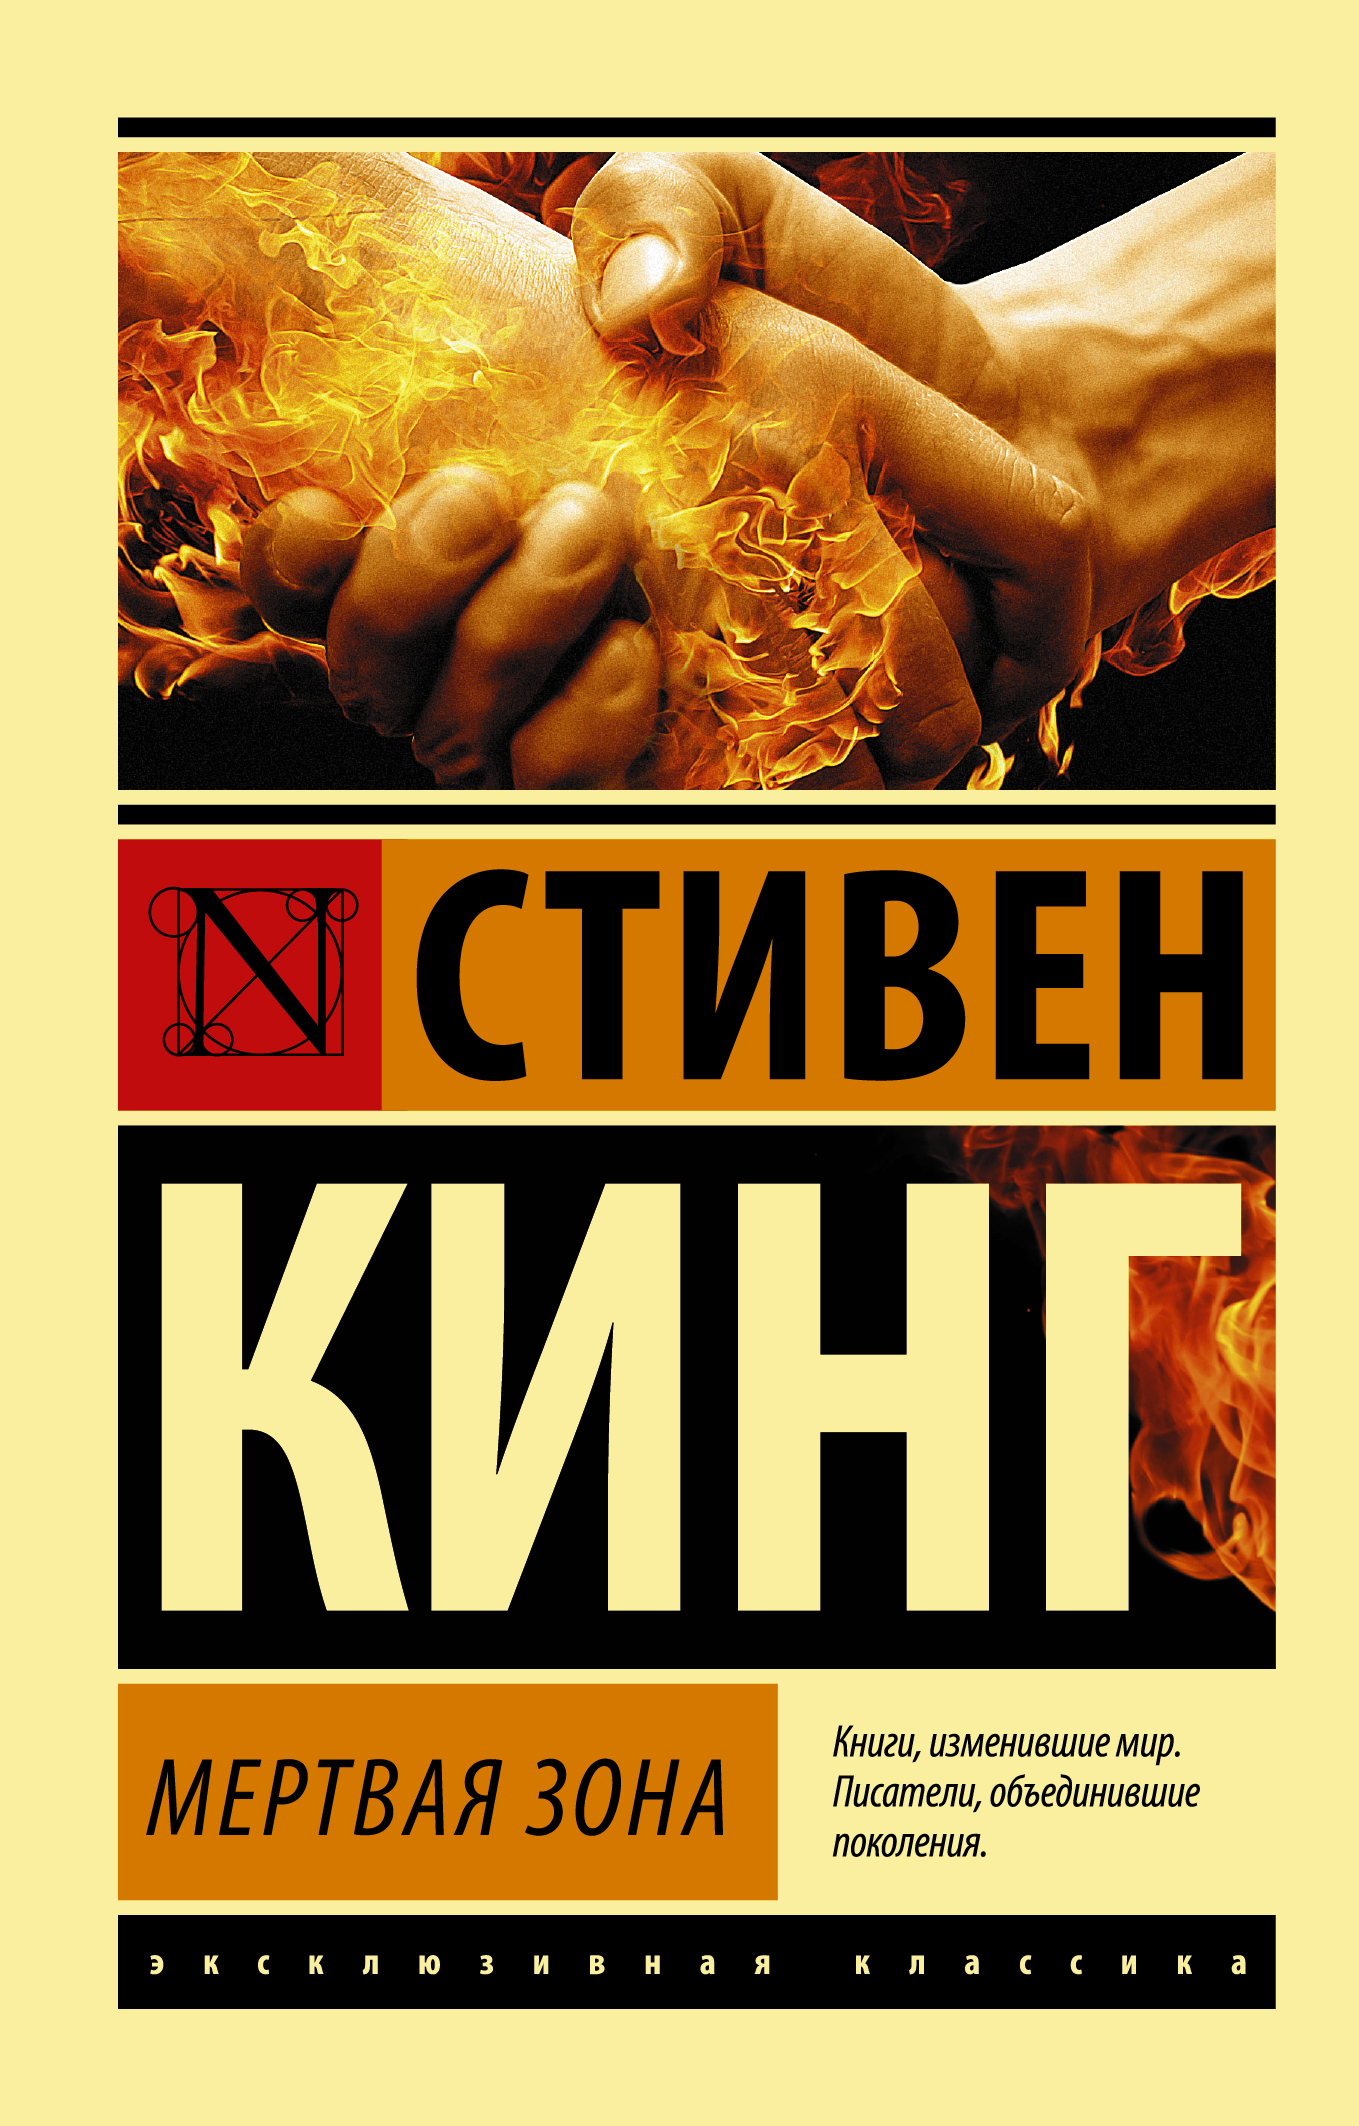 Кинг С. Мертвая зона ISBN: 978-5-17-084167-7 александр беляев мертвая зона